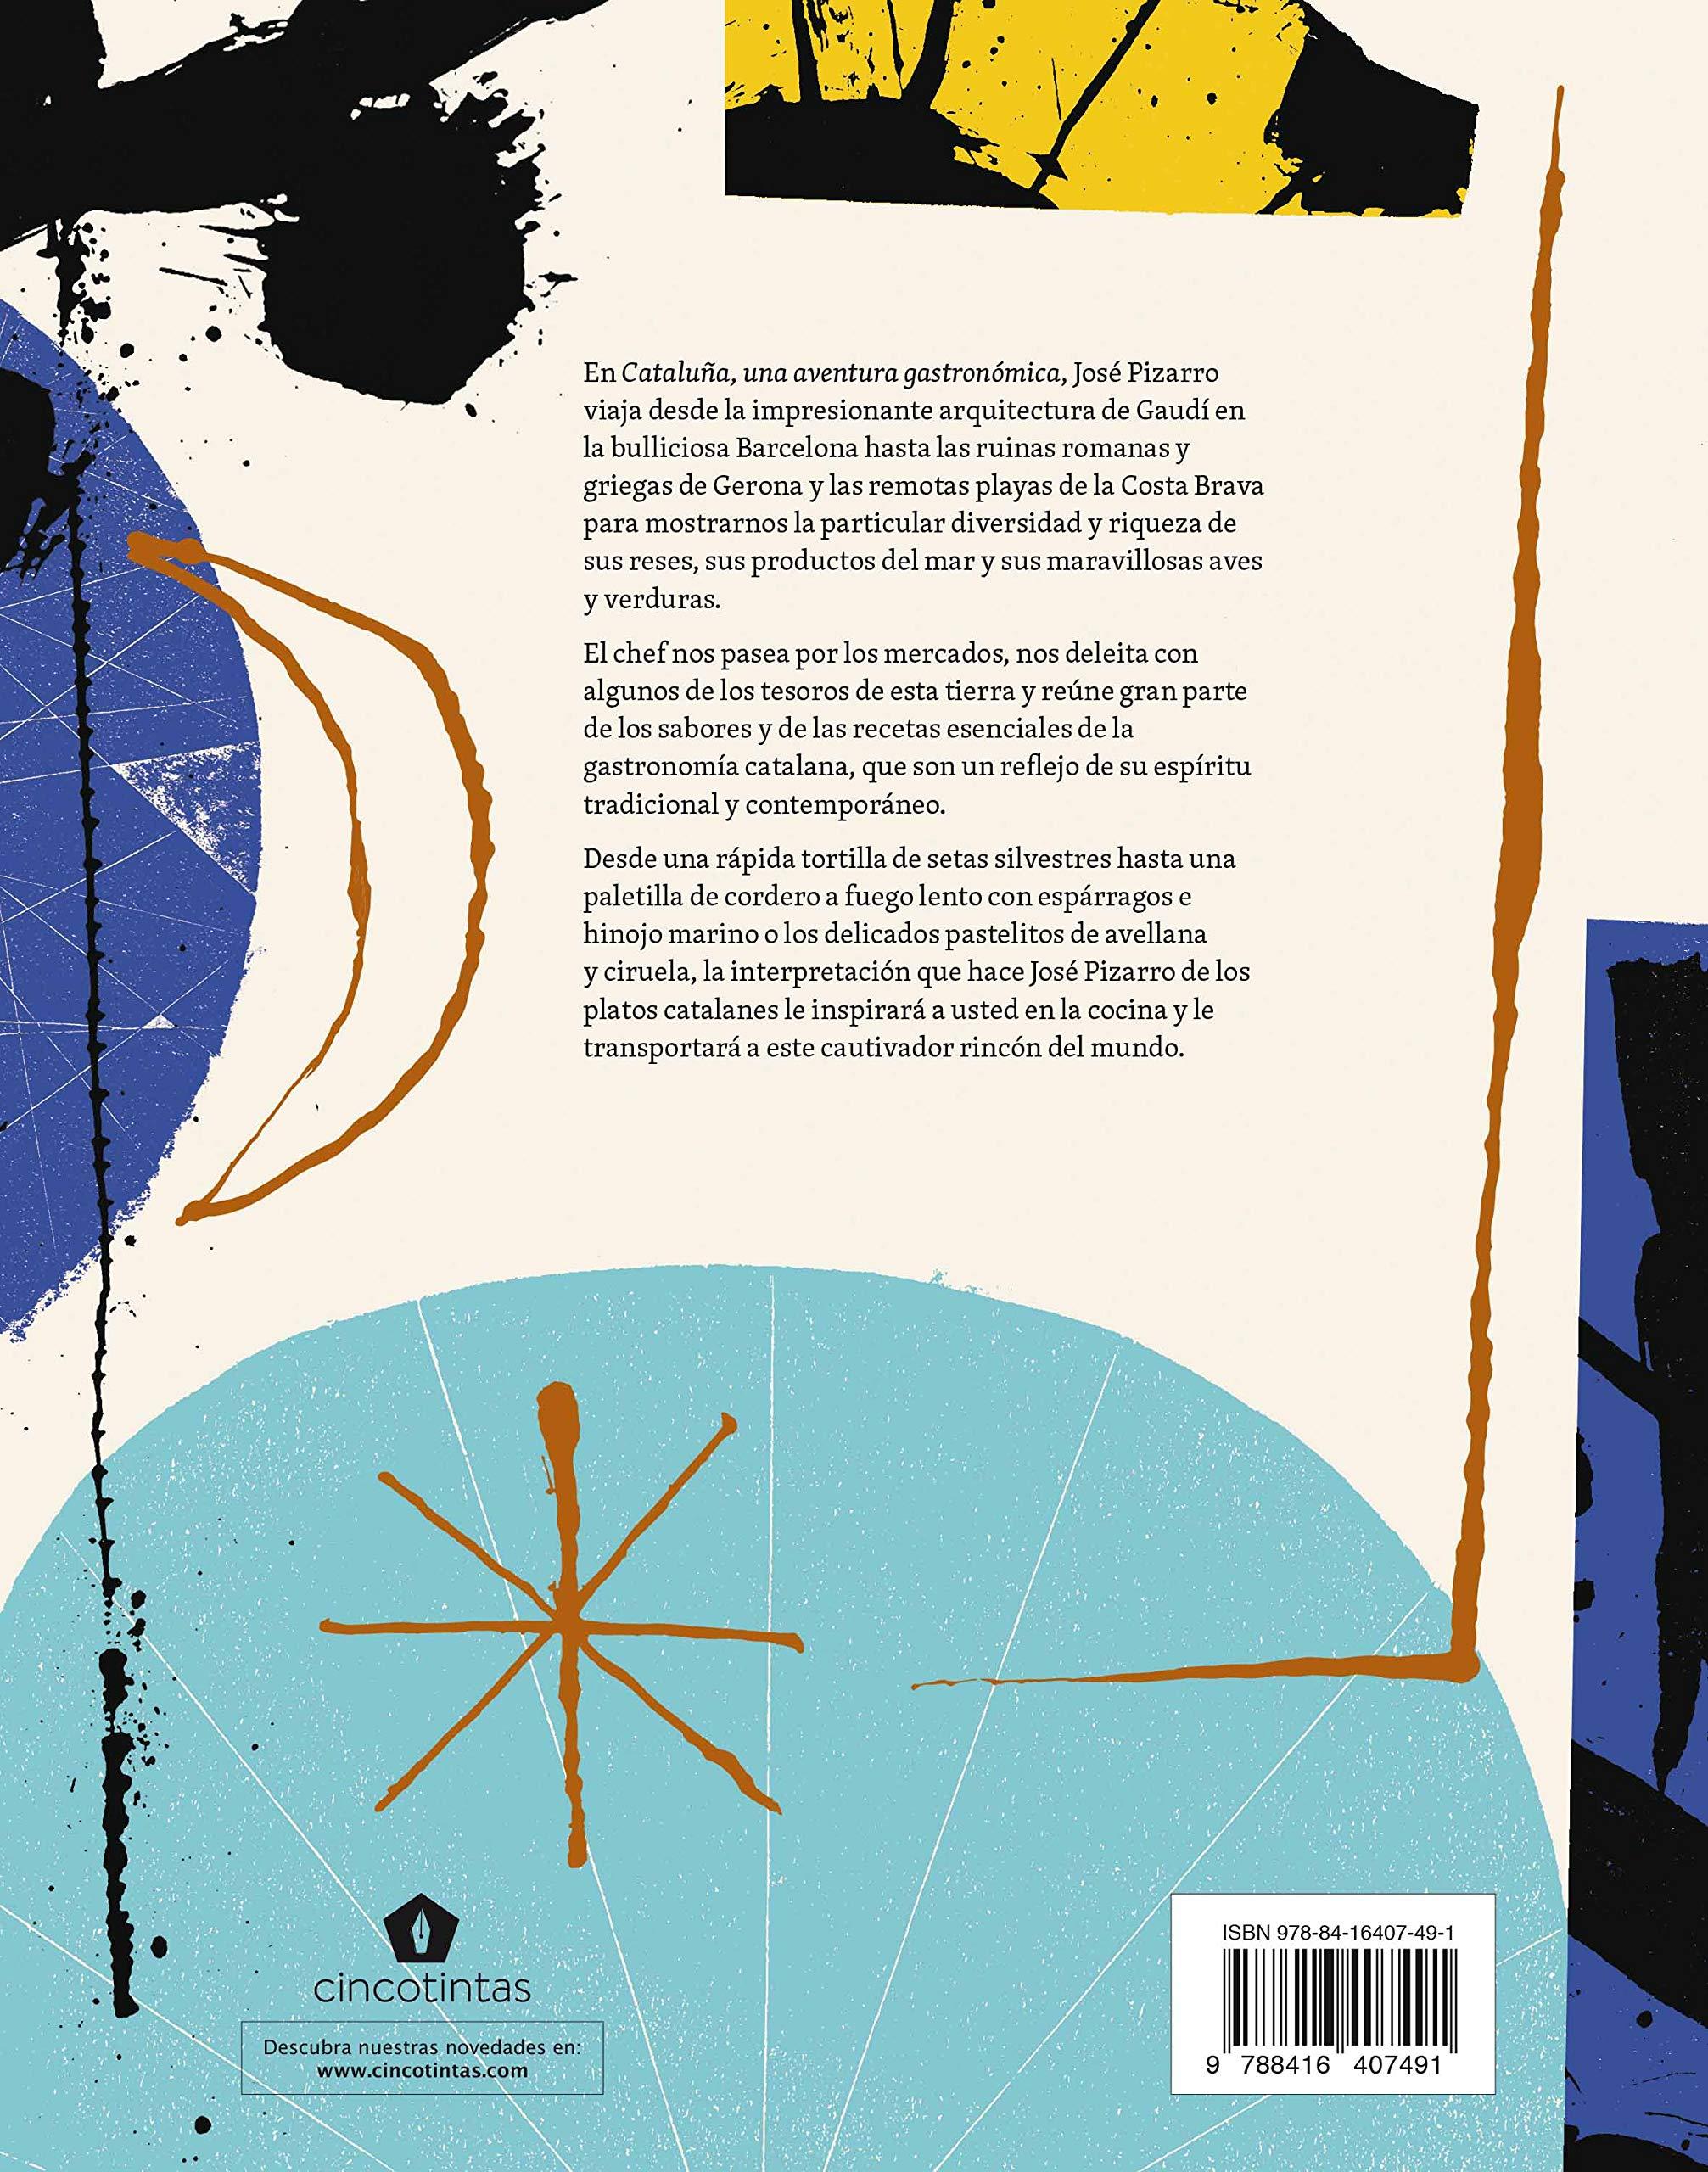 Cataluña: Una aventura gastronómica (Spanish Edition): José Pizarro: 9788416407491: Amazon.com: Books